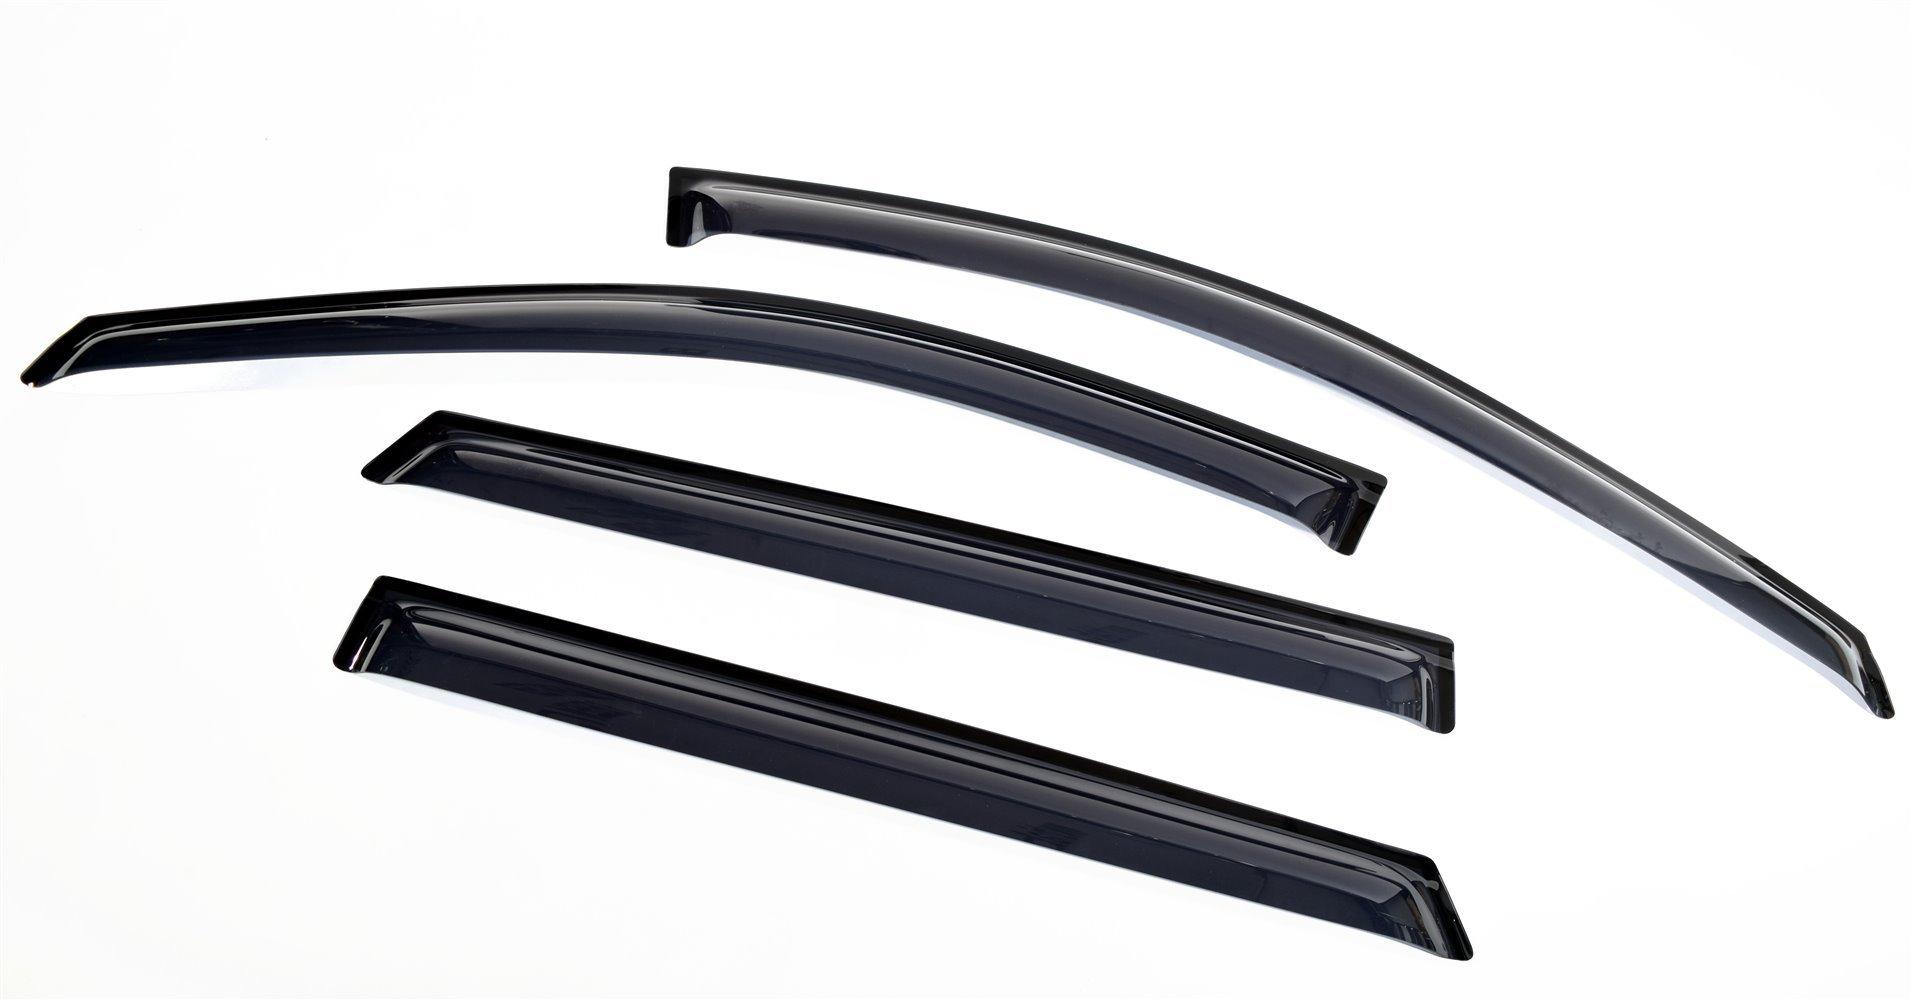 Дефлекторы боковых окон Hyundai Grand Santa Fe (2013- / 2015- ) (4шт.) (темн.)